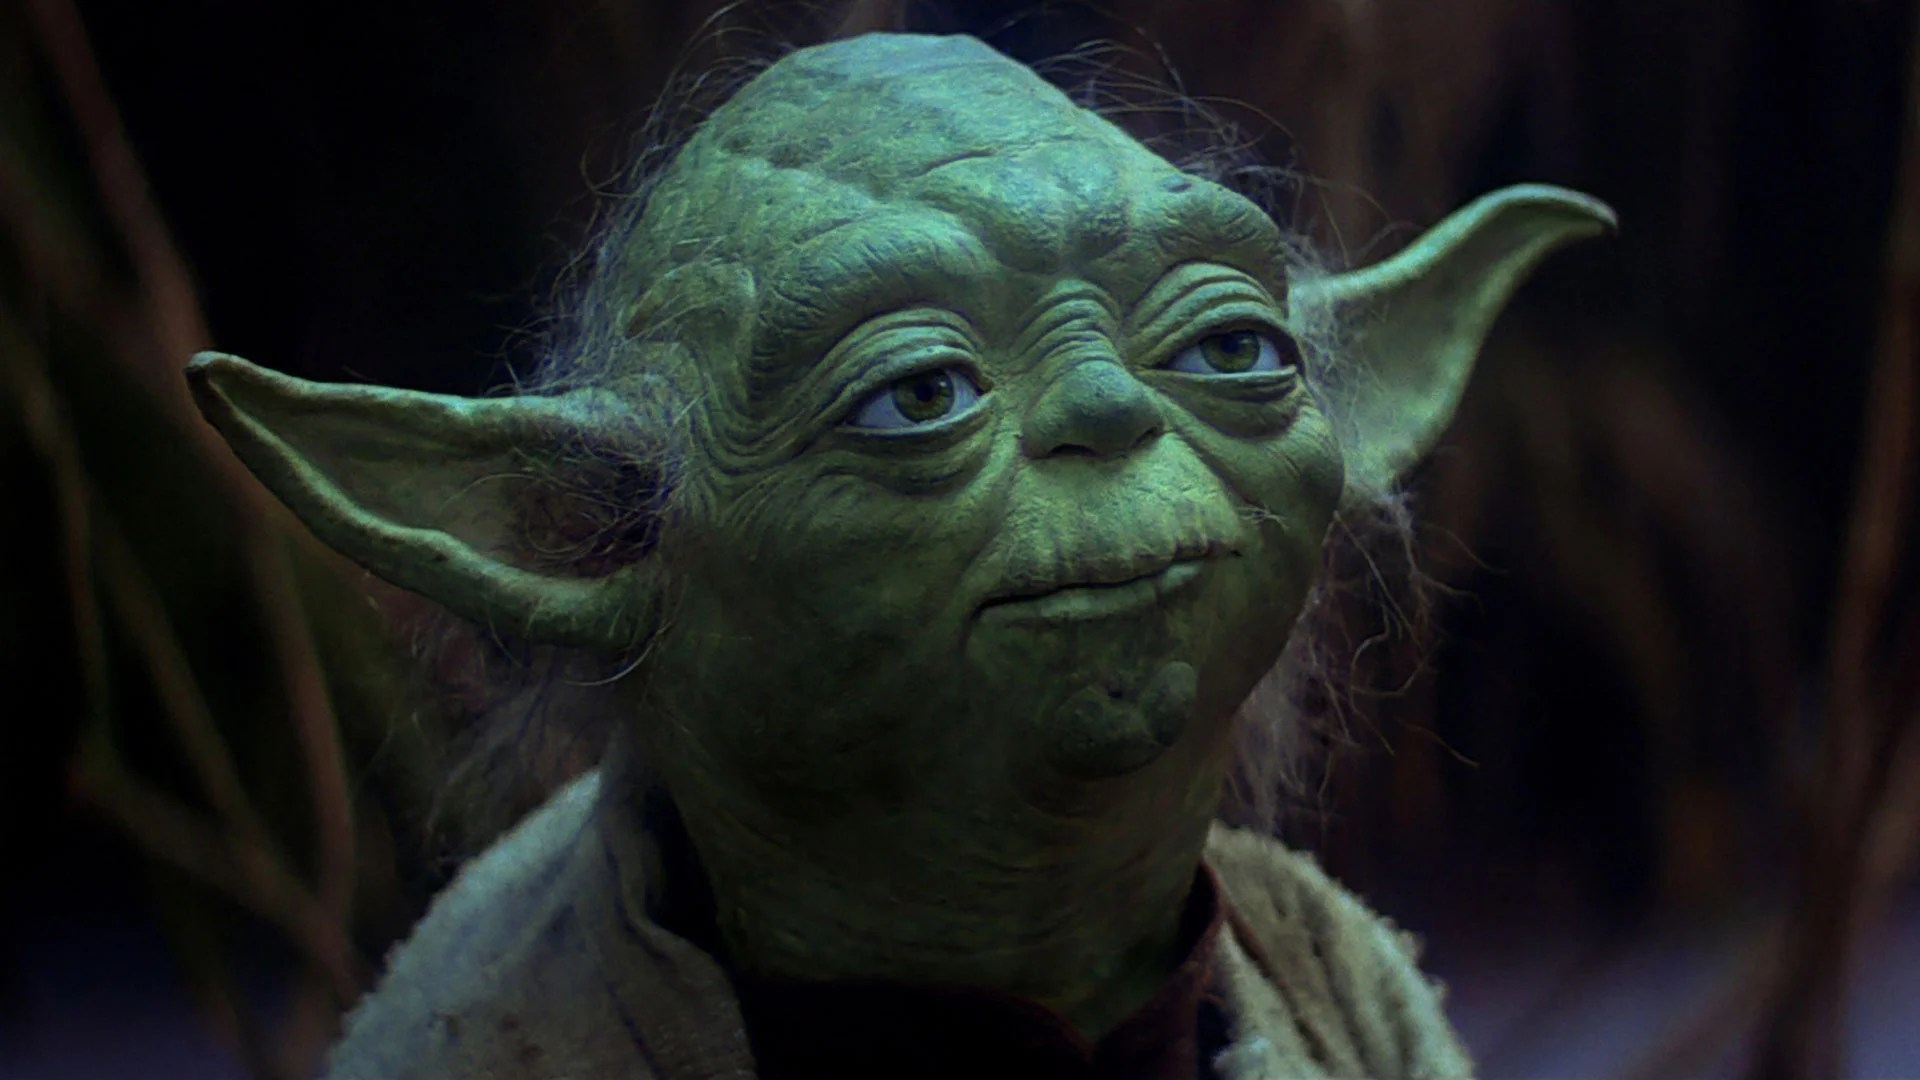 Star Wars Yoda Nearly Almost In Key The Force Awakens Scene